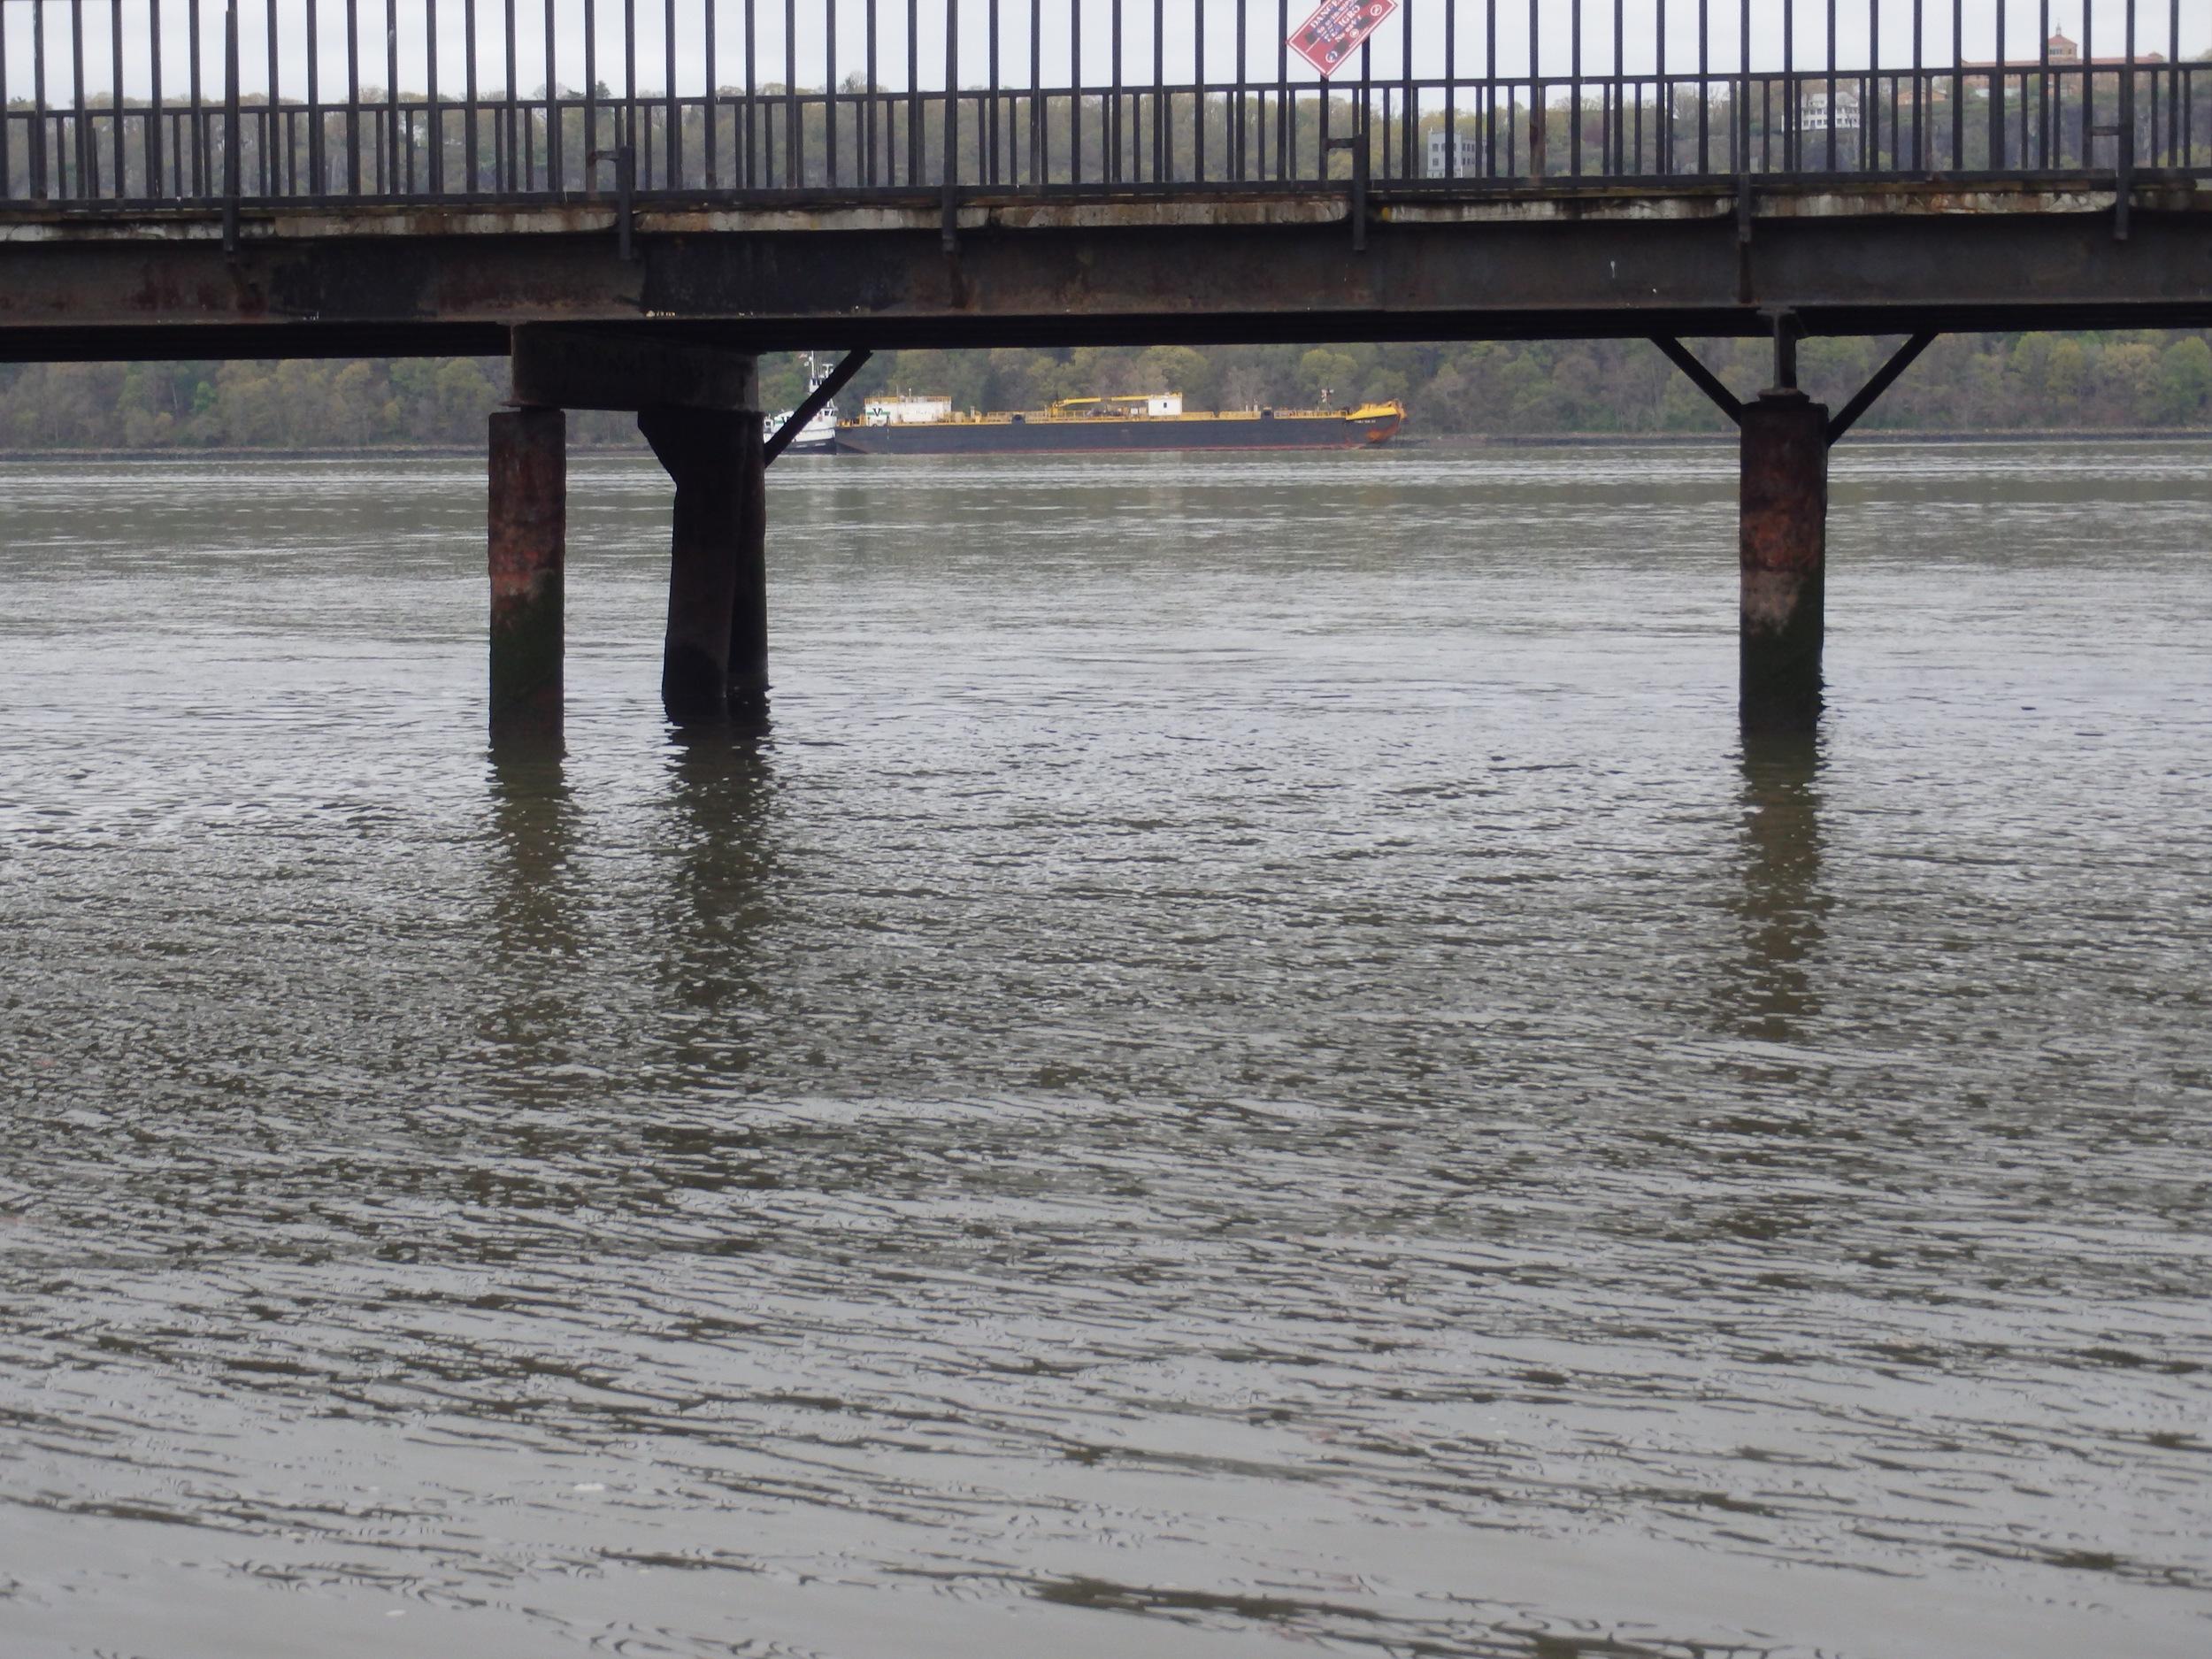 Peering under the pier...